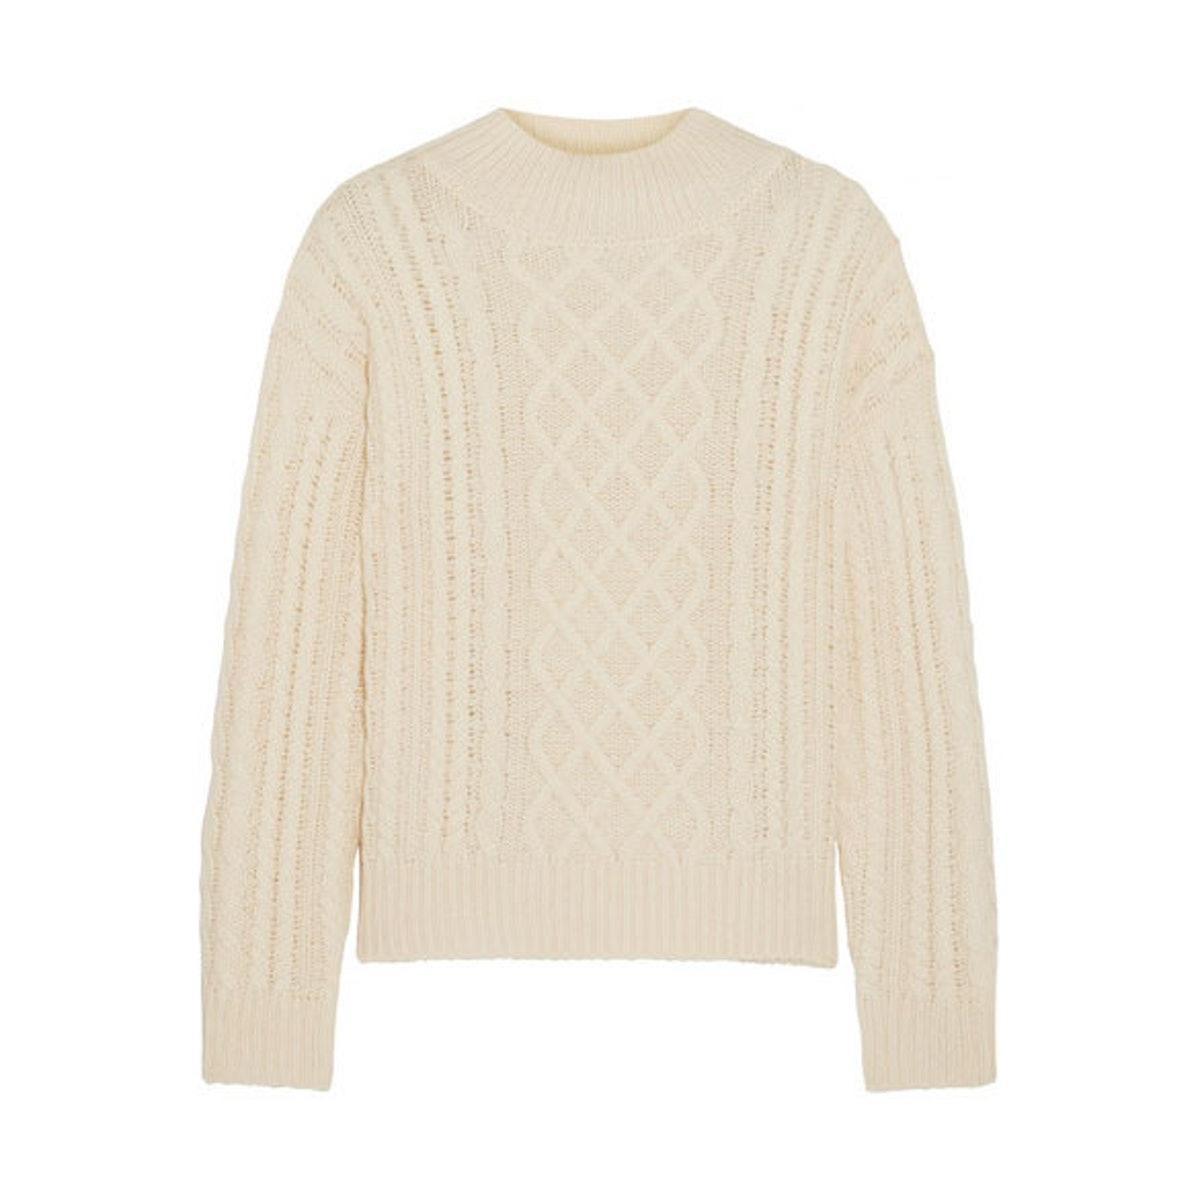 Frame Denim sweater